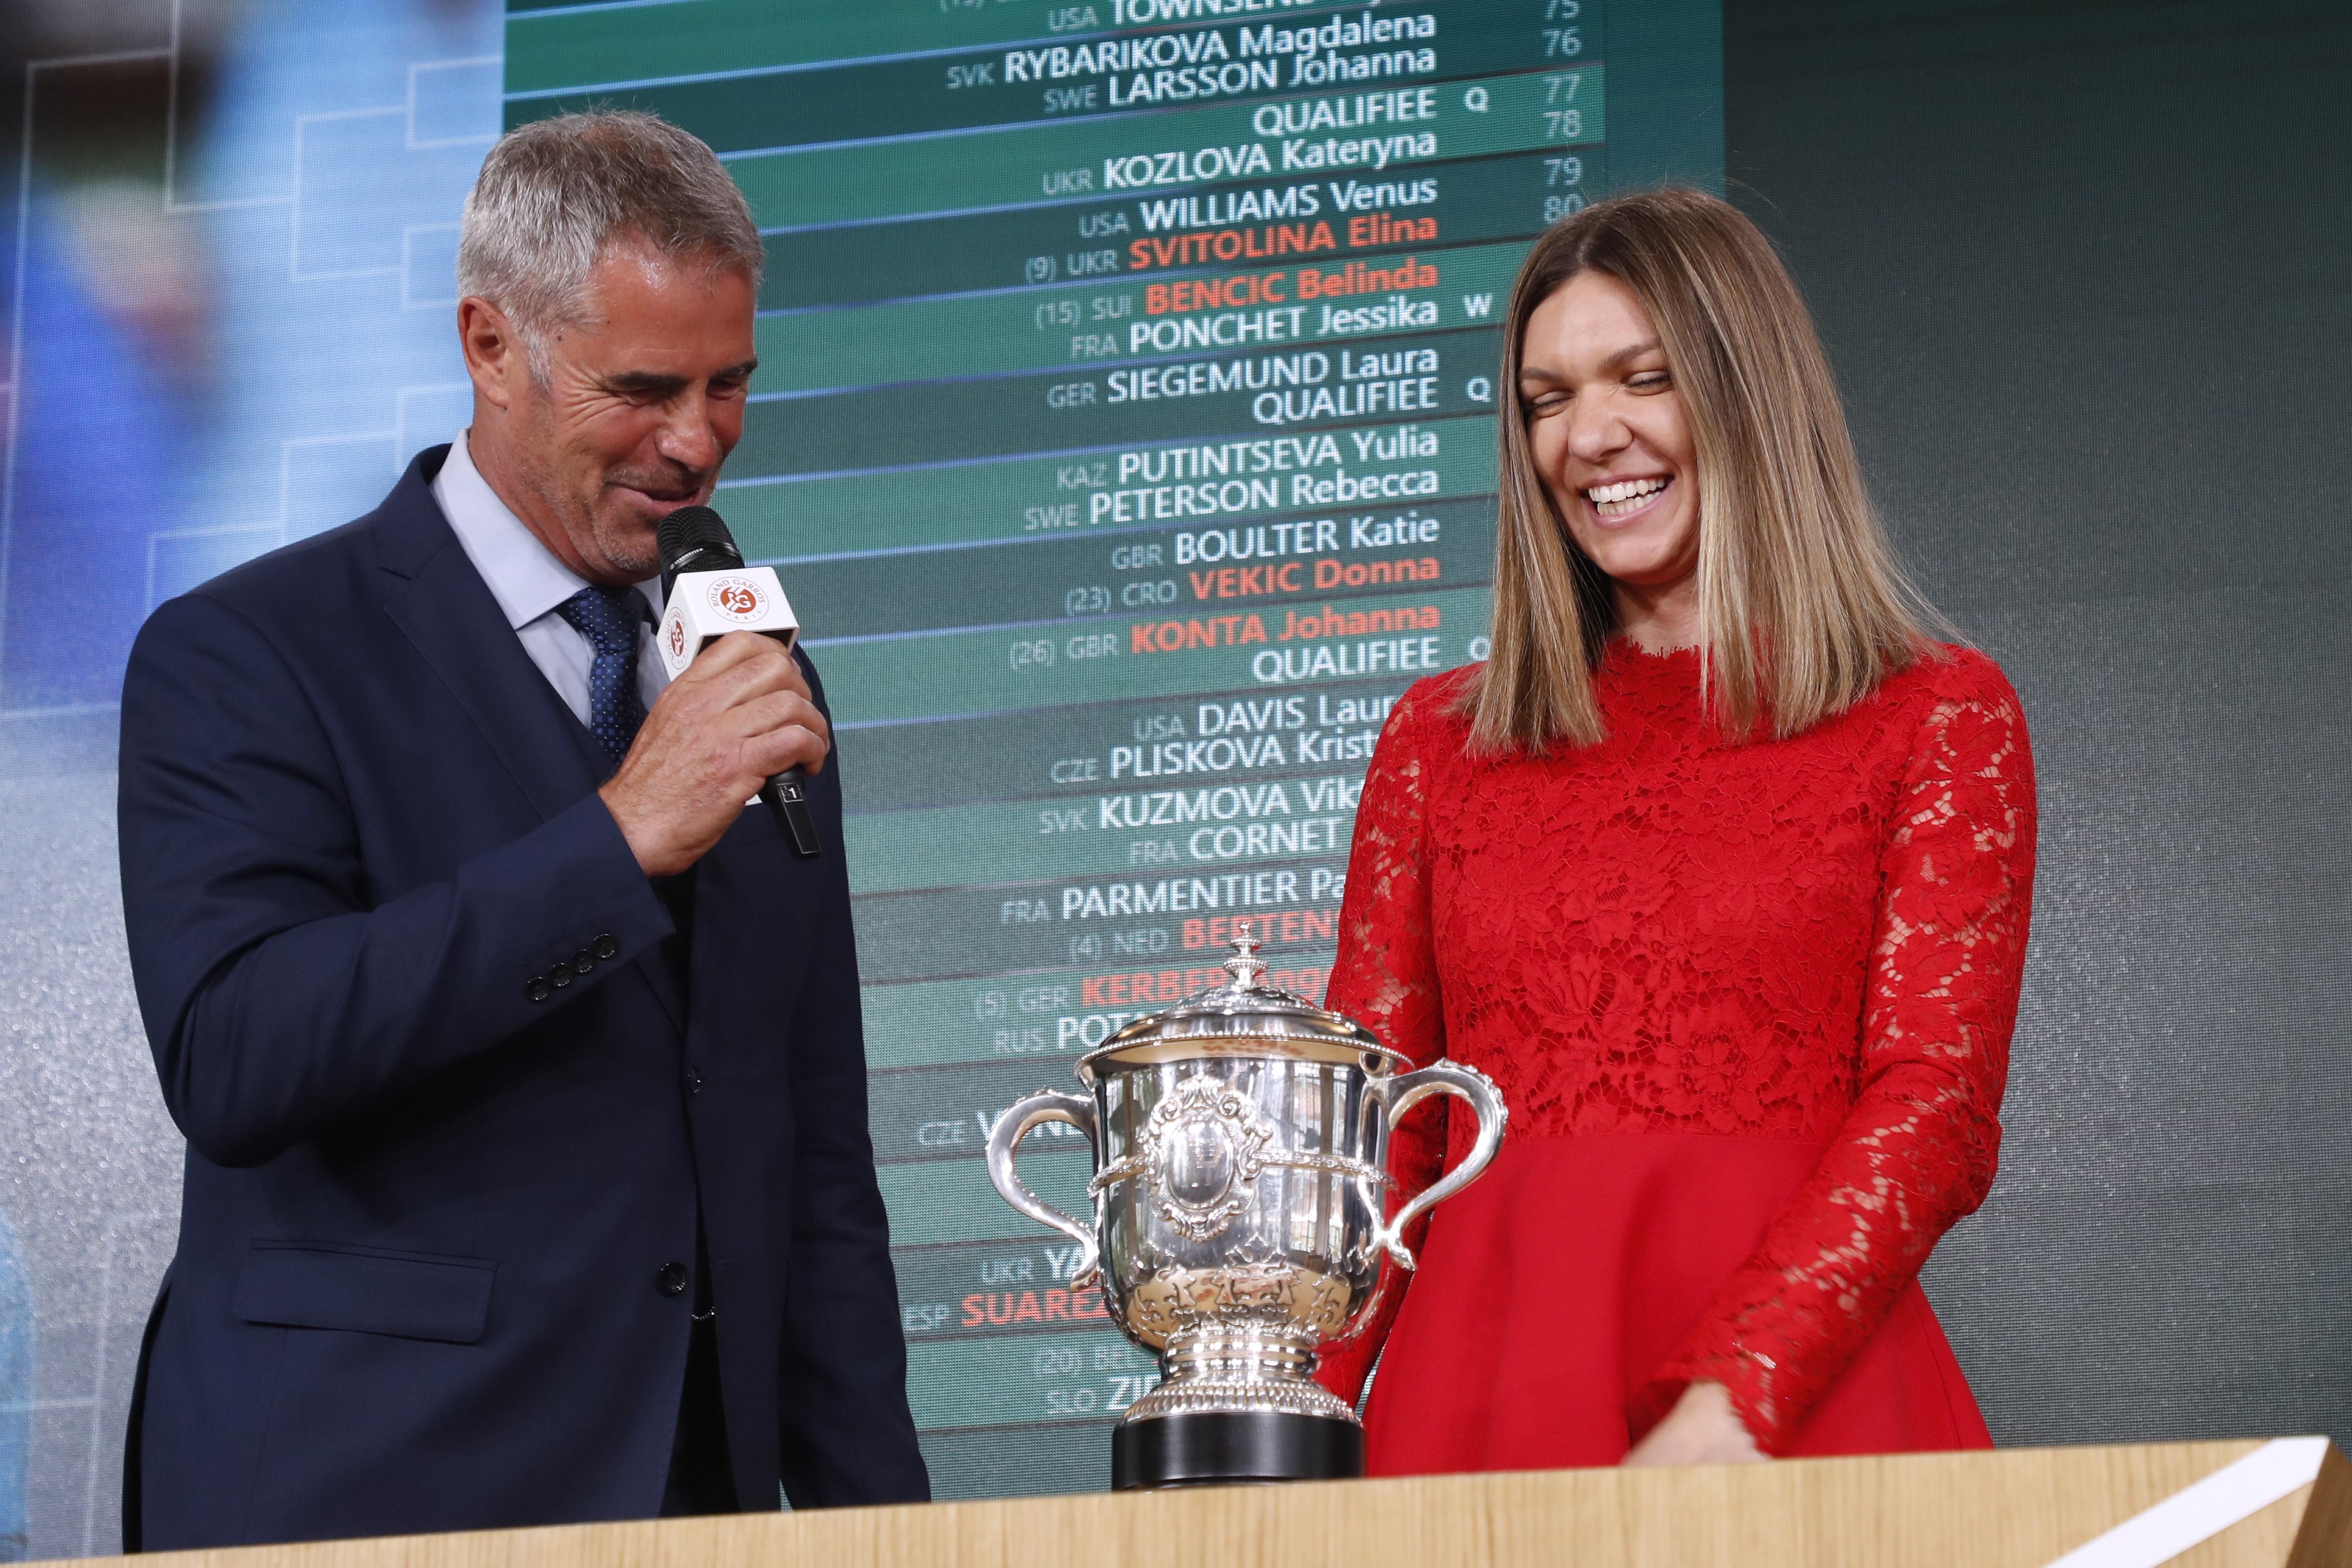 Simona Halep lors du tirage au sort 2019